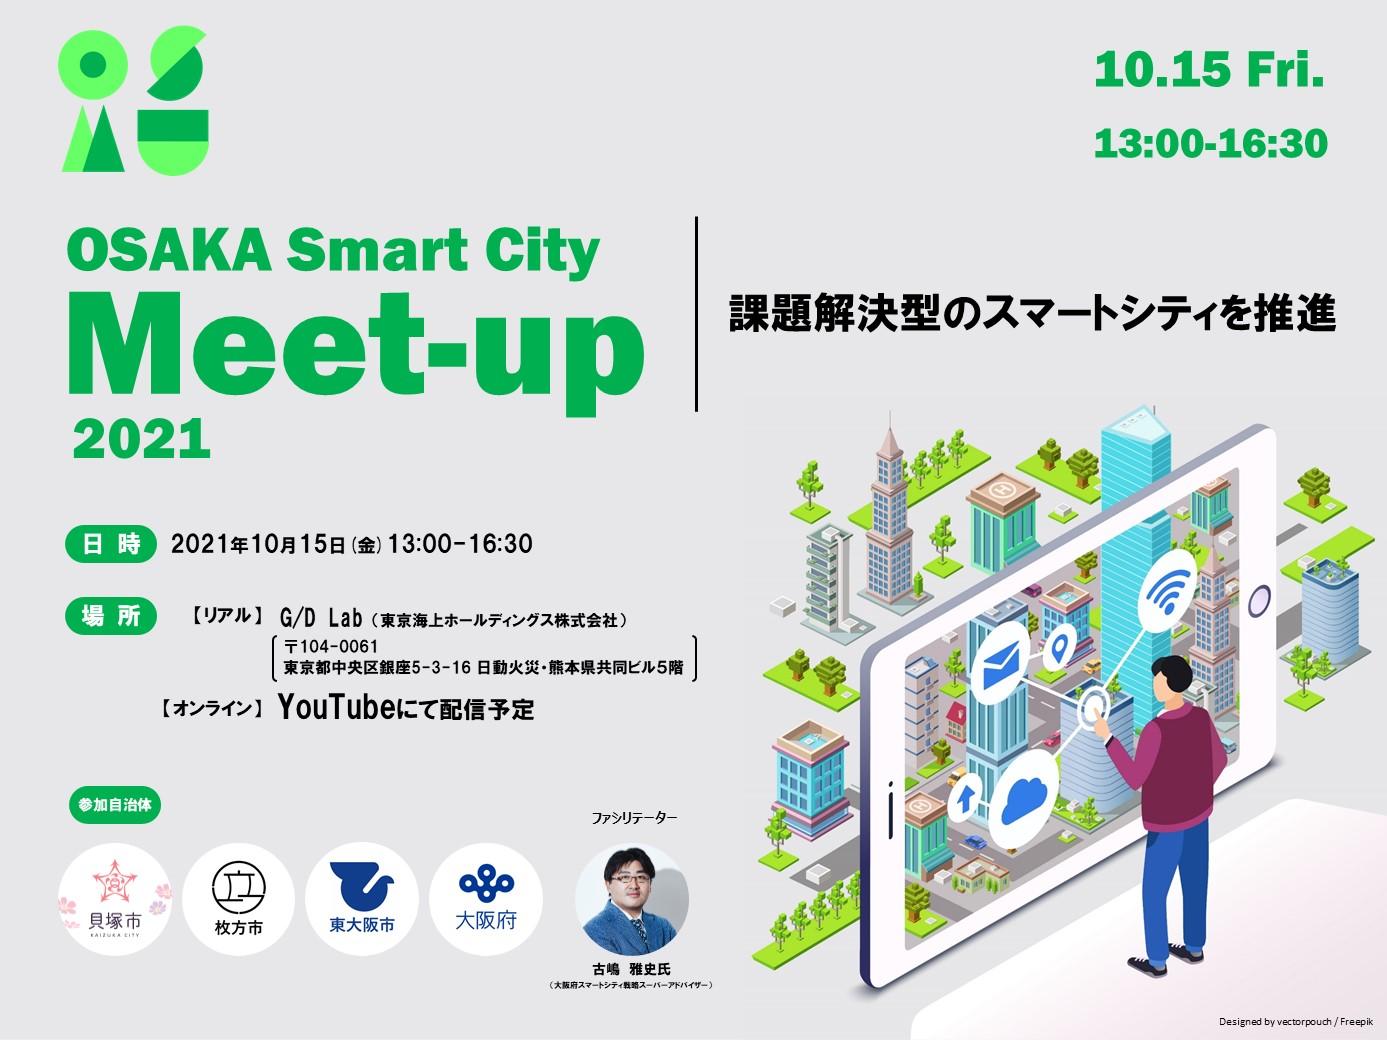 「OSAKA Smart City Meet-up 2021」を開催します!